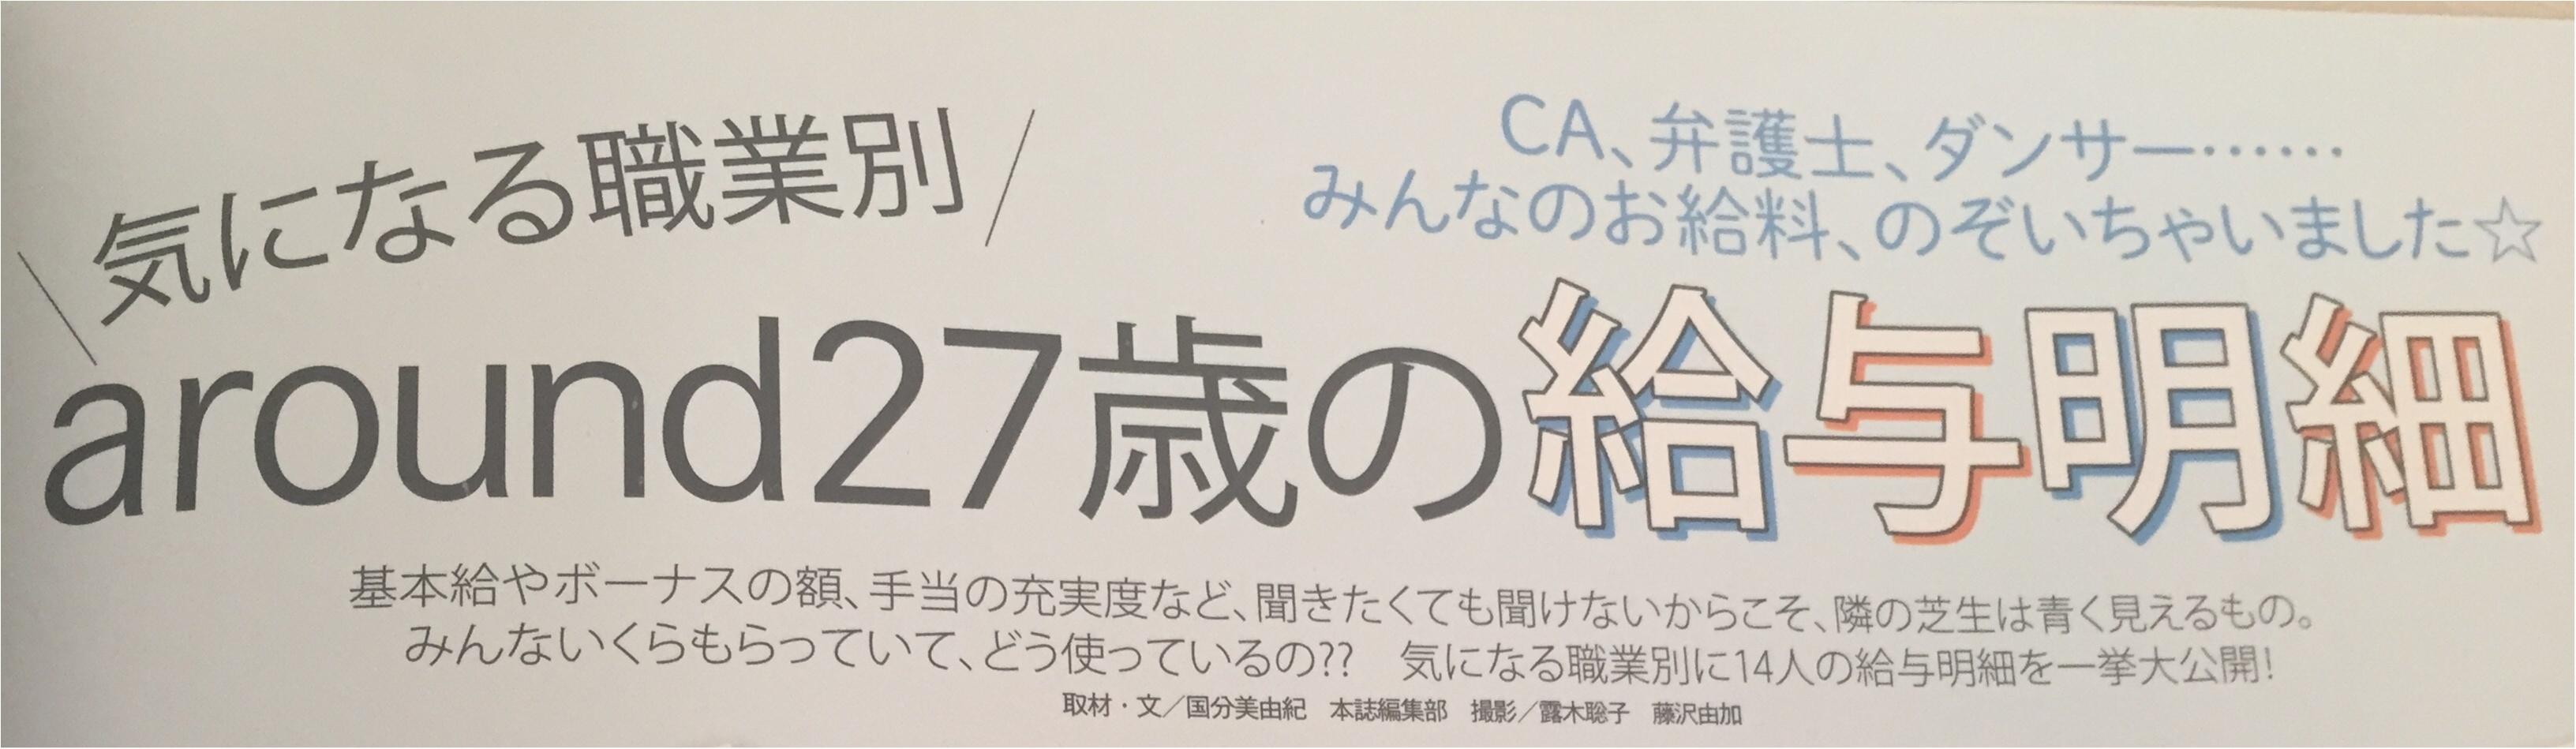 【MORE12月号☆発売中】特別付録はCOACHステーショナリー4点セット✨≪samenyan≫_14